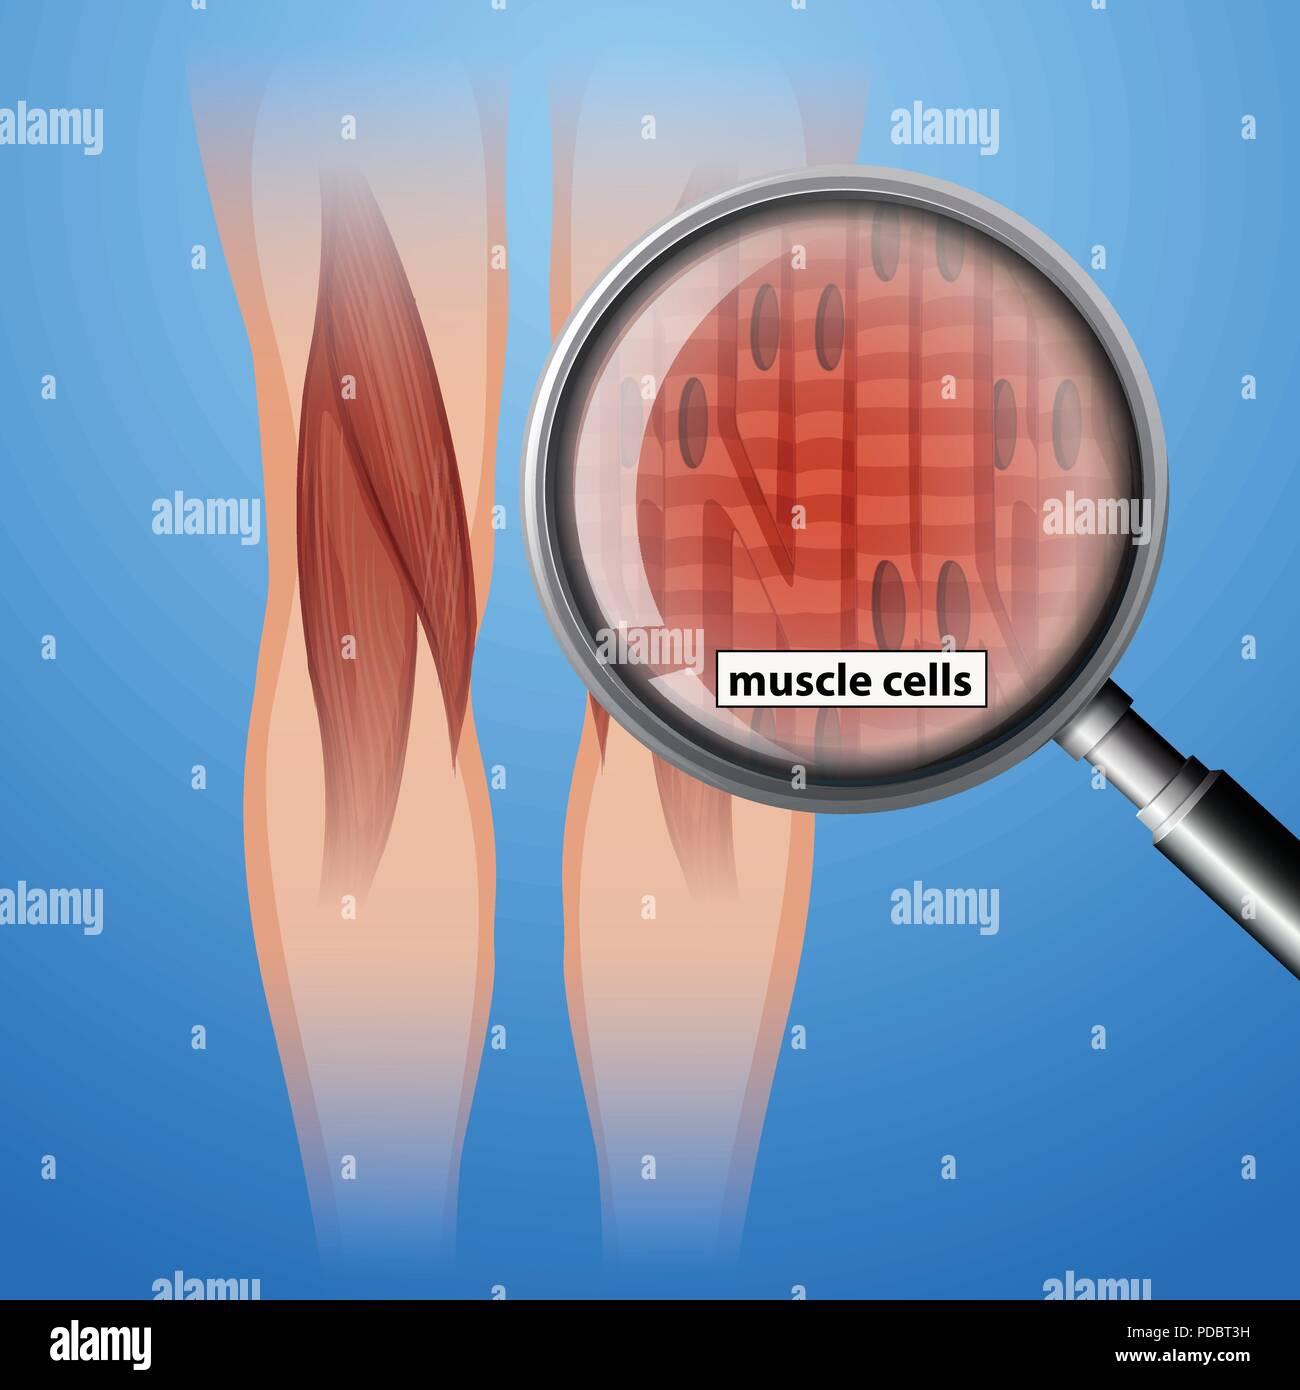 Human Anatomy Muscle Cells Illustration Stock Vector Art